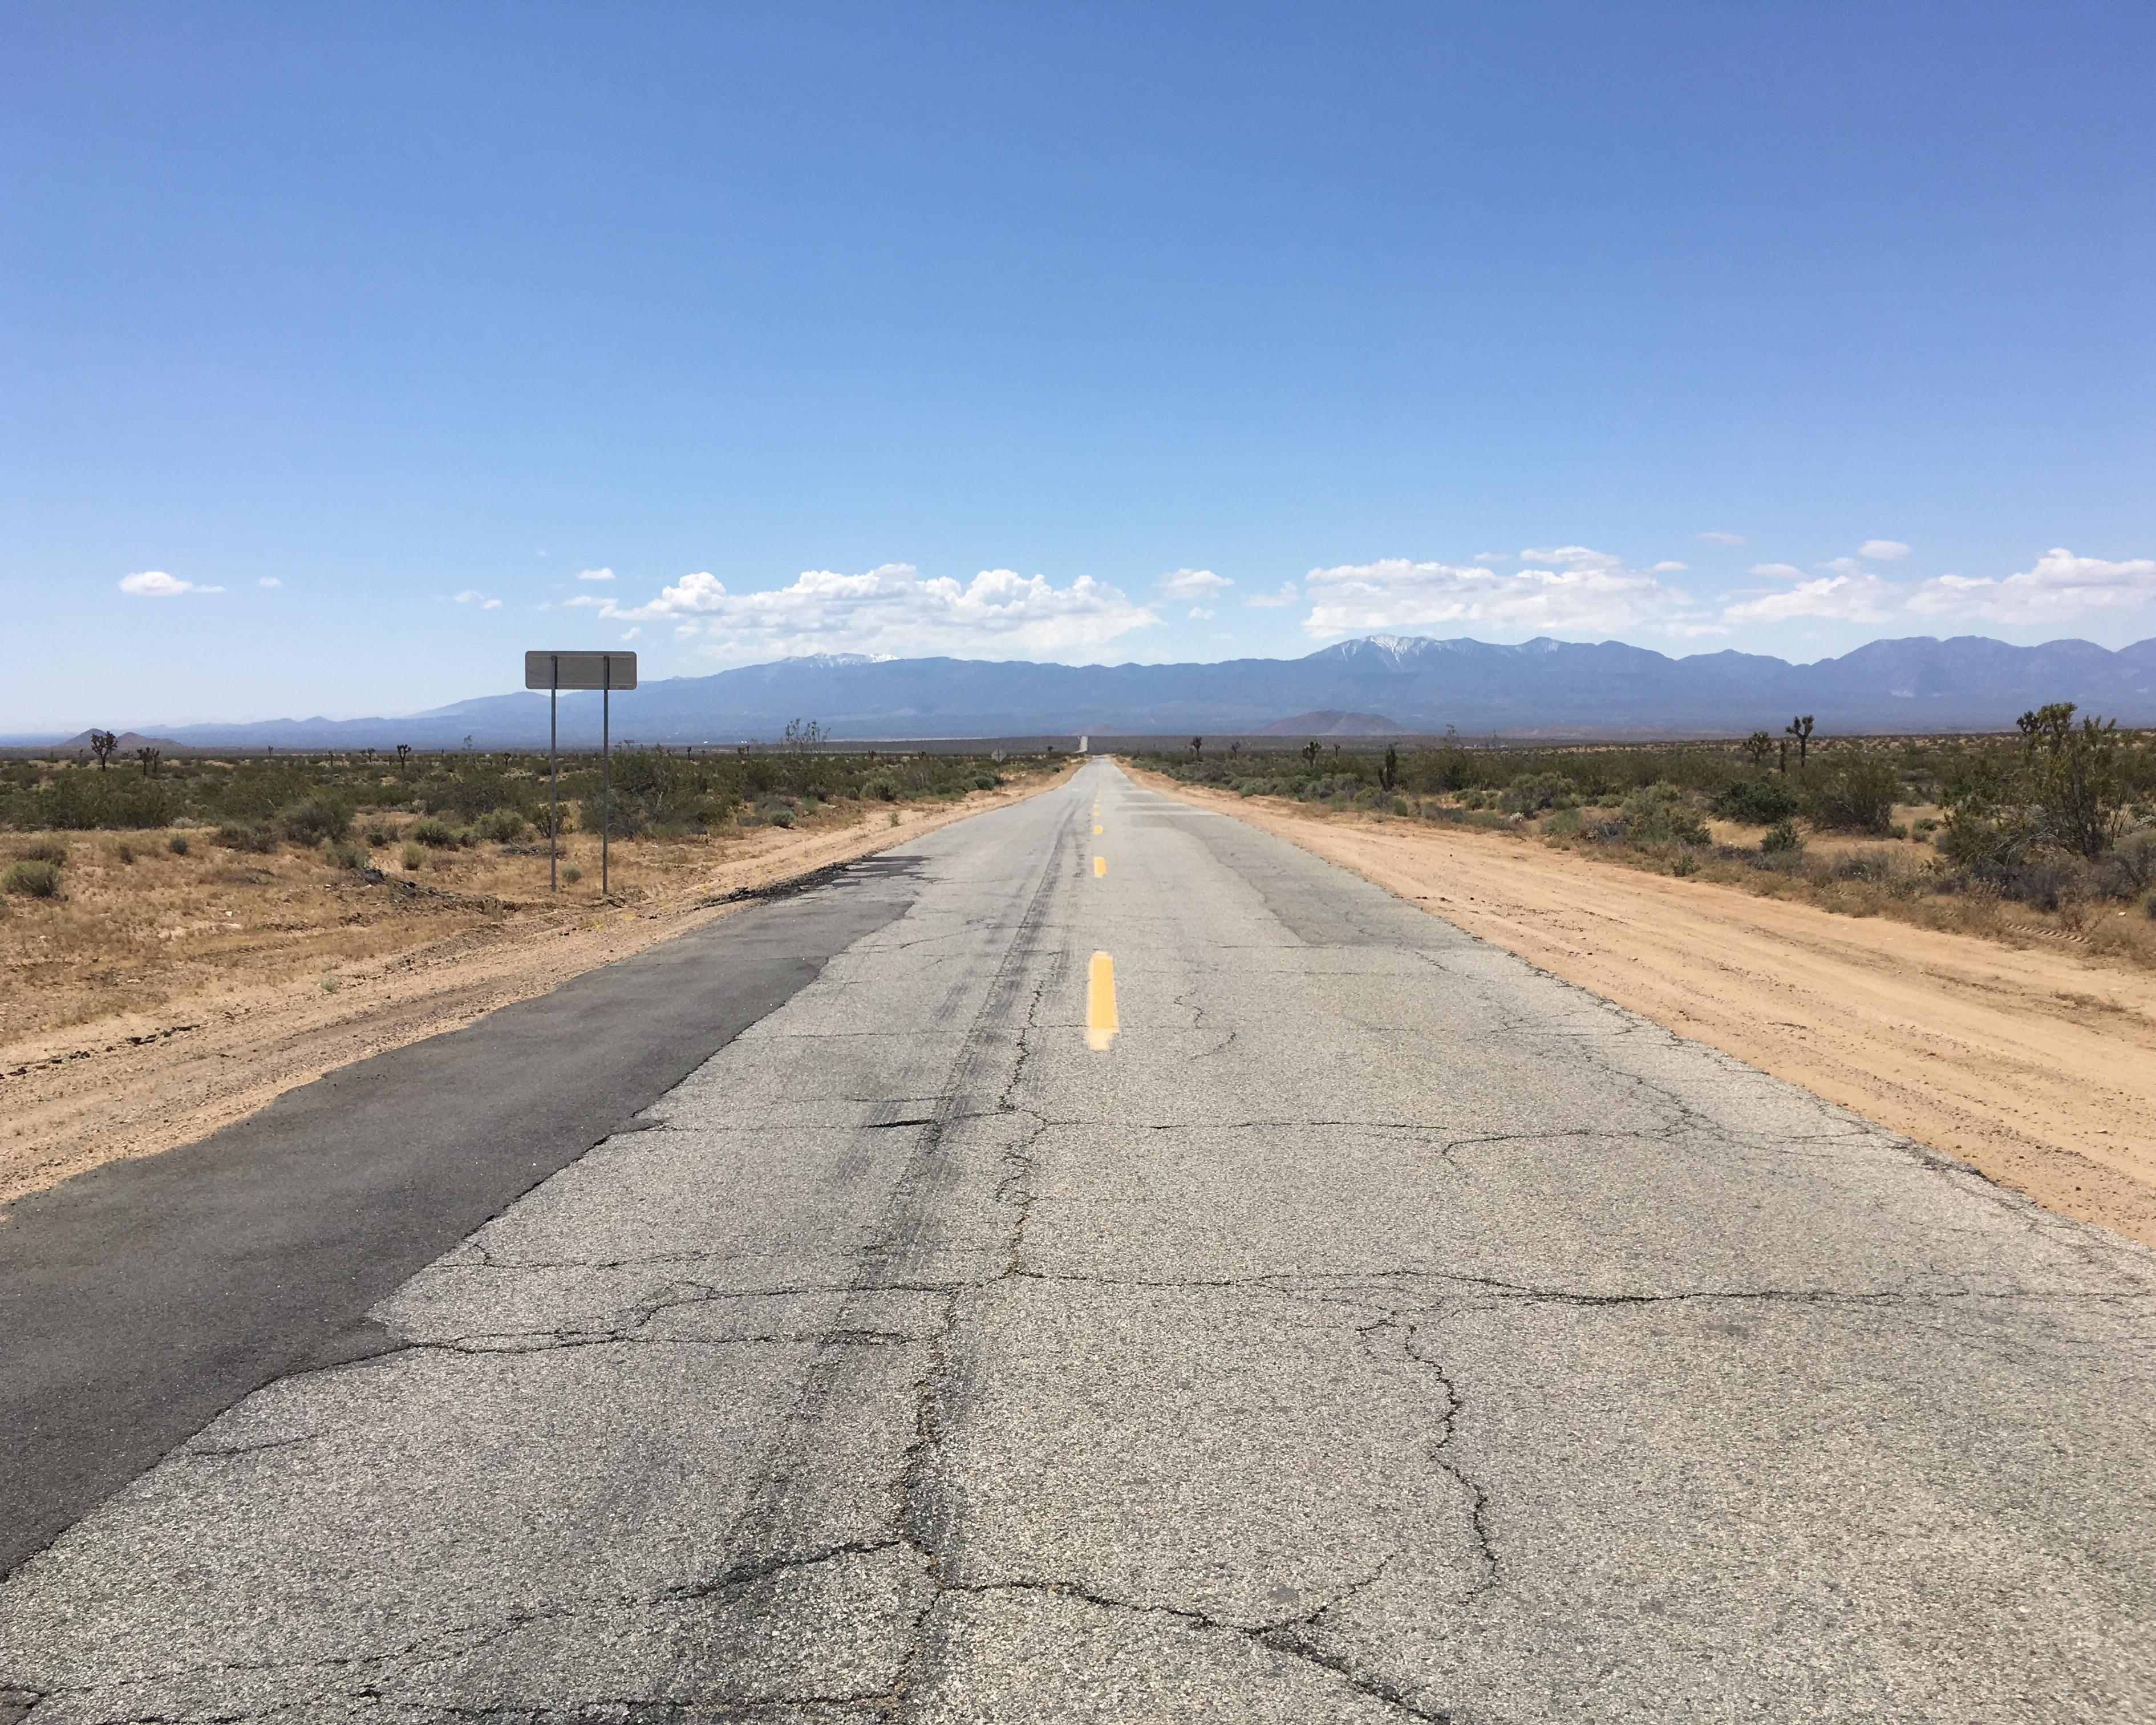 Fotos gratis : paisaje, horizonte, sol, la carretera, autopista ...